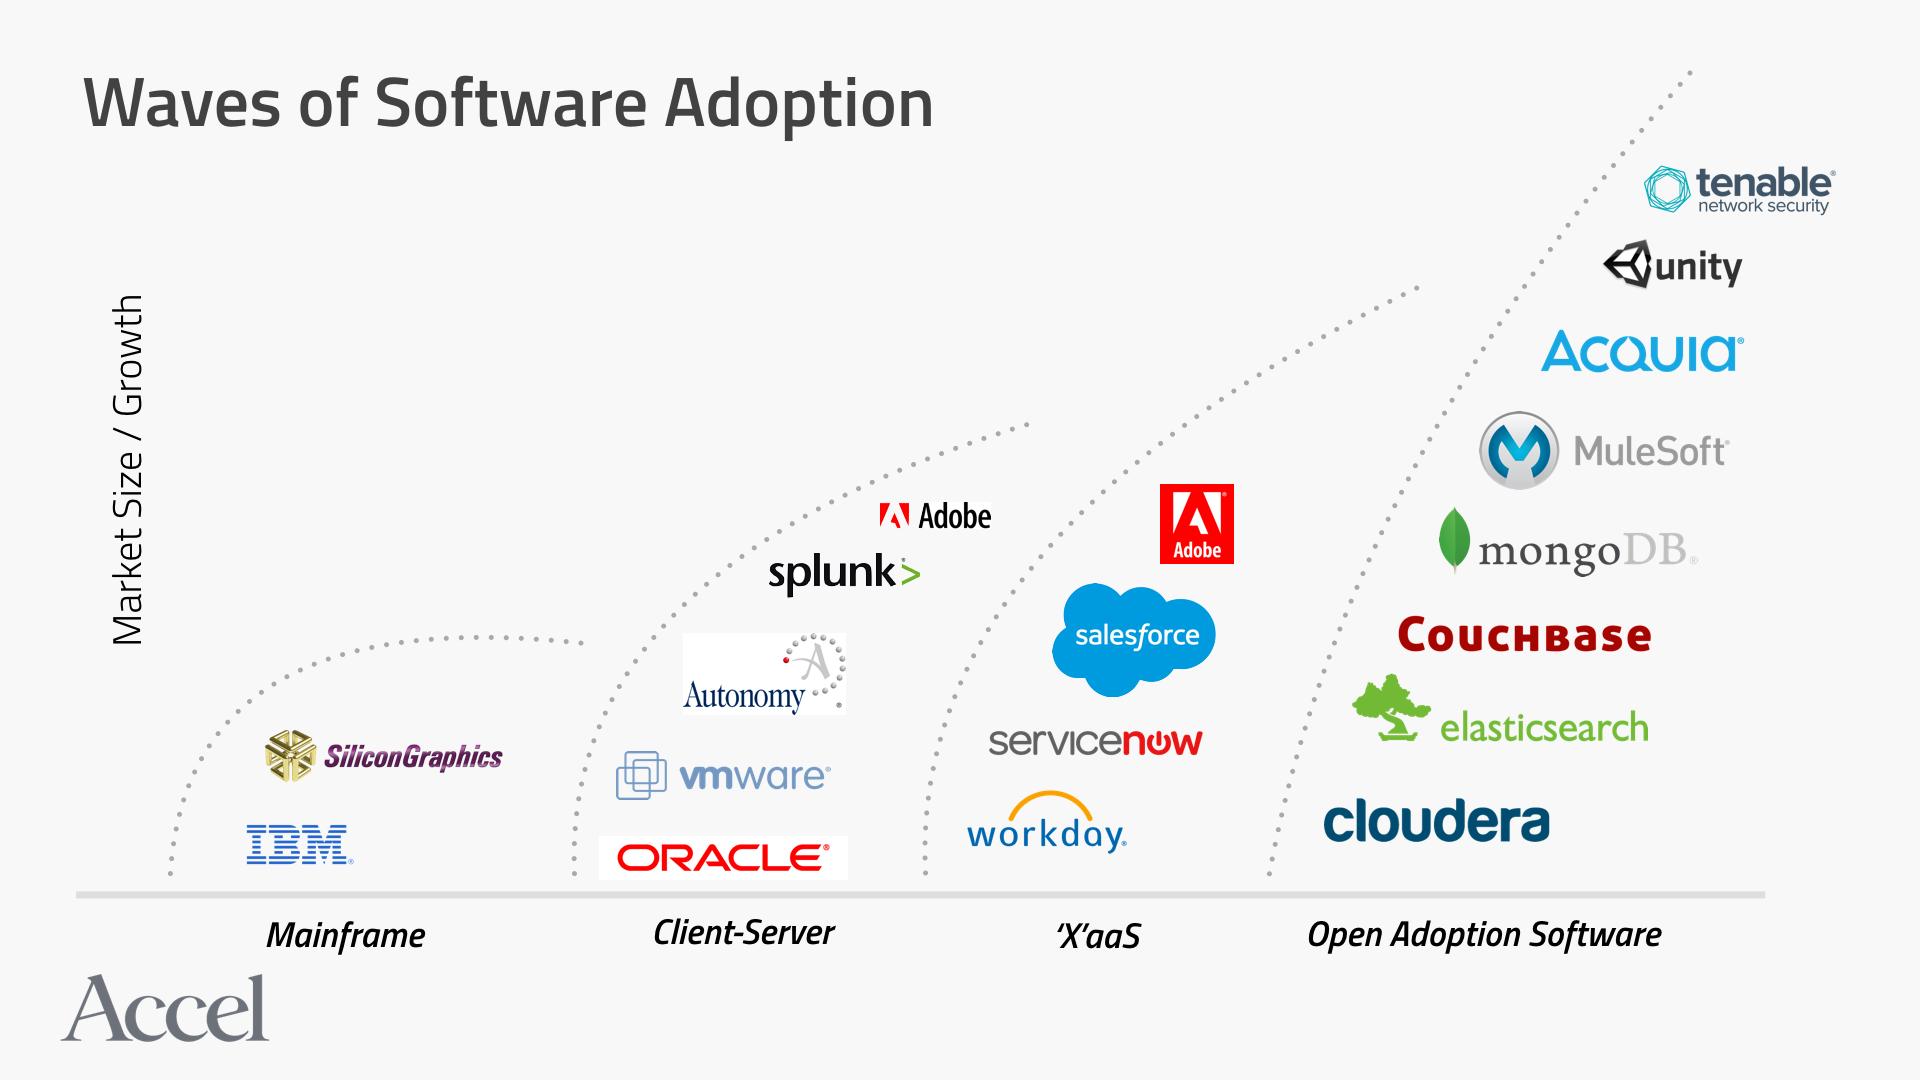 Waves of software adoption